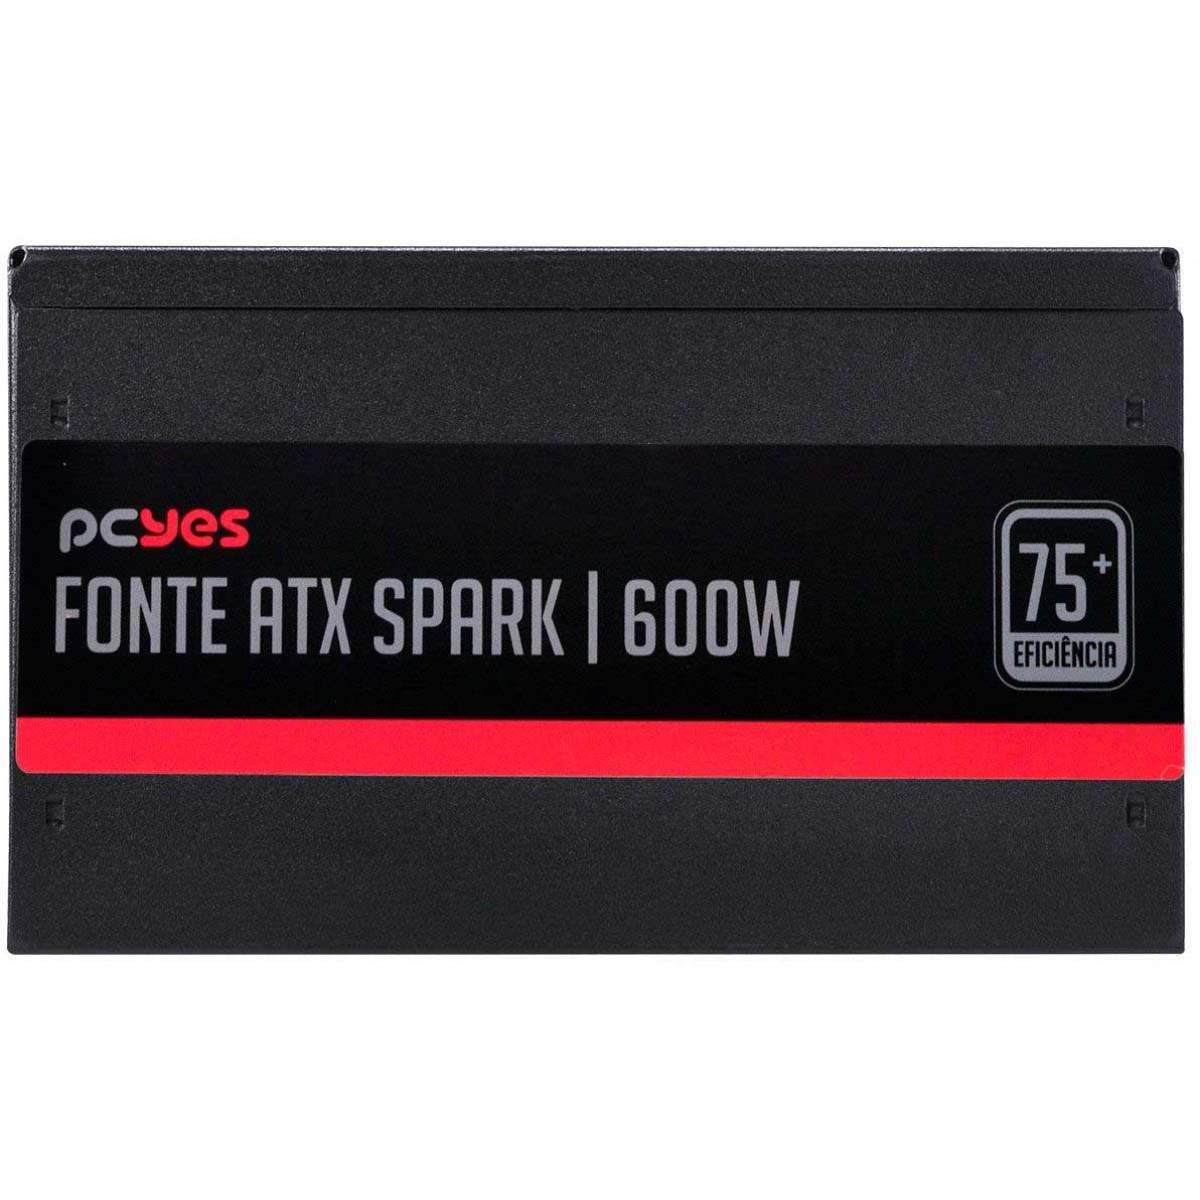 Fonte PCYES Spark 600W, Eficiência 75+, PFC Ativo PXSP600WPT